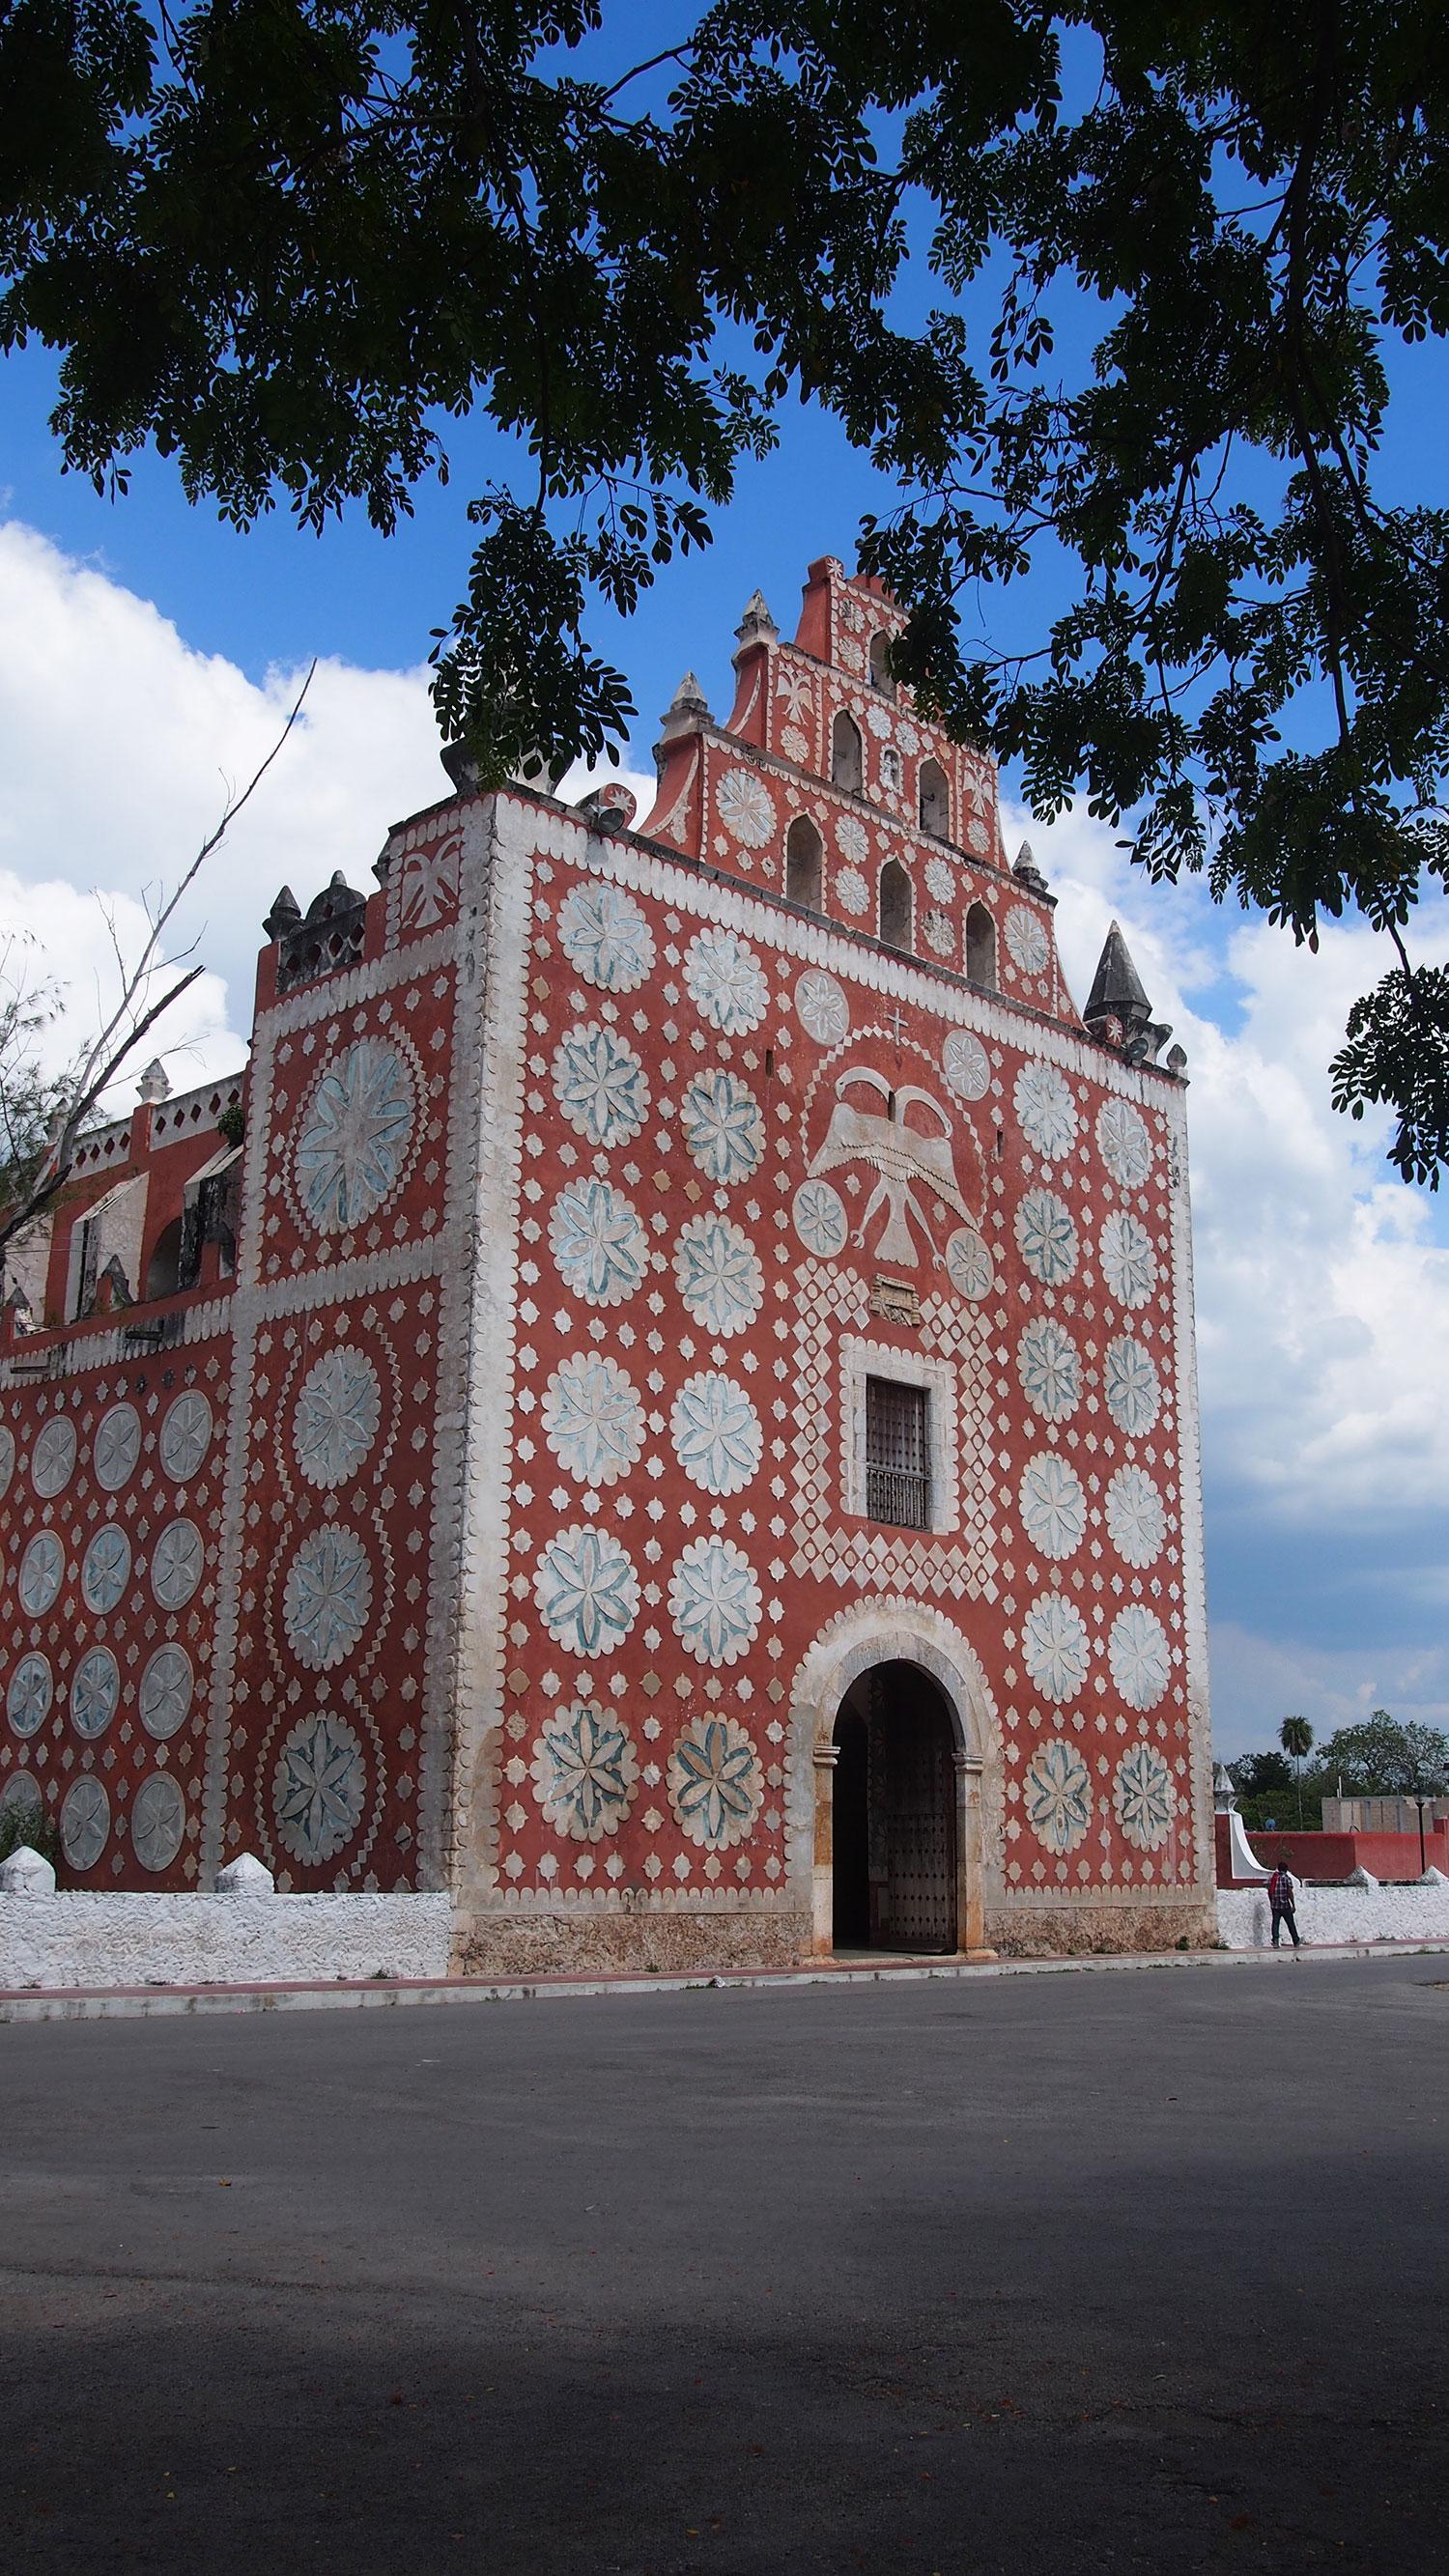 Hammocks_and_Ruins_What_to_Do_Mexico_Mayan_pyramid_town_Uayma_53.jpg